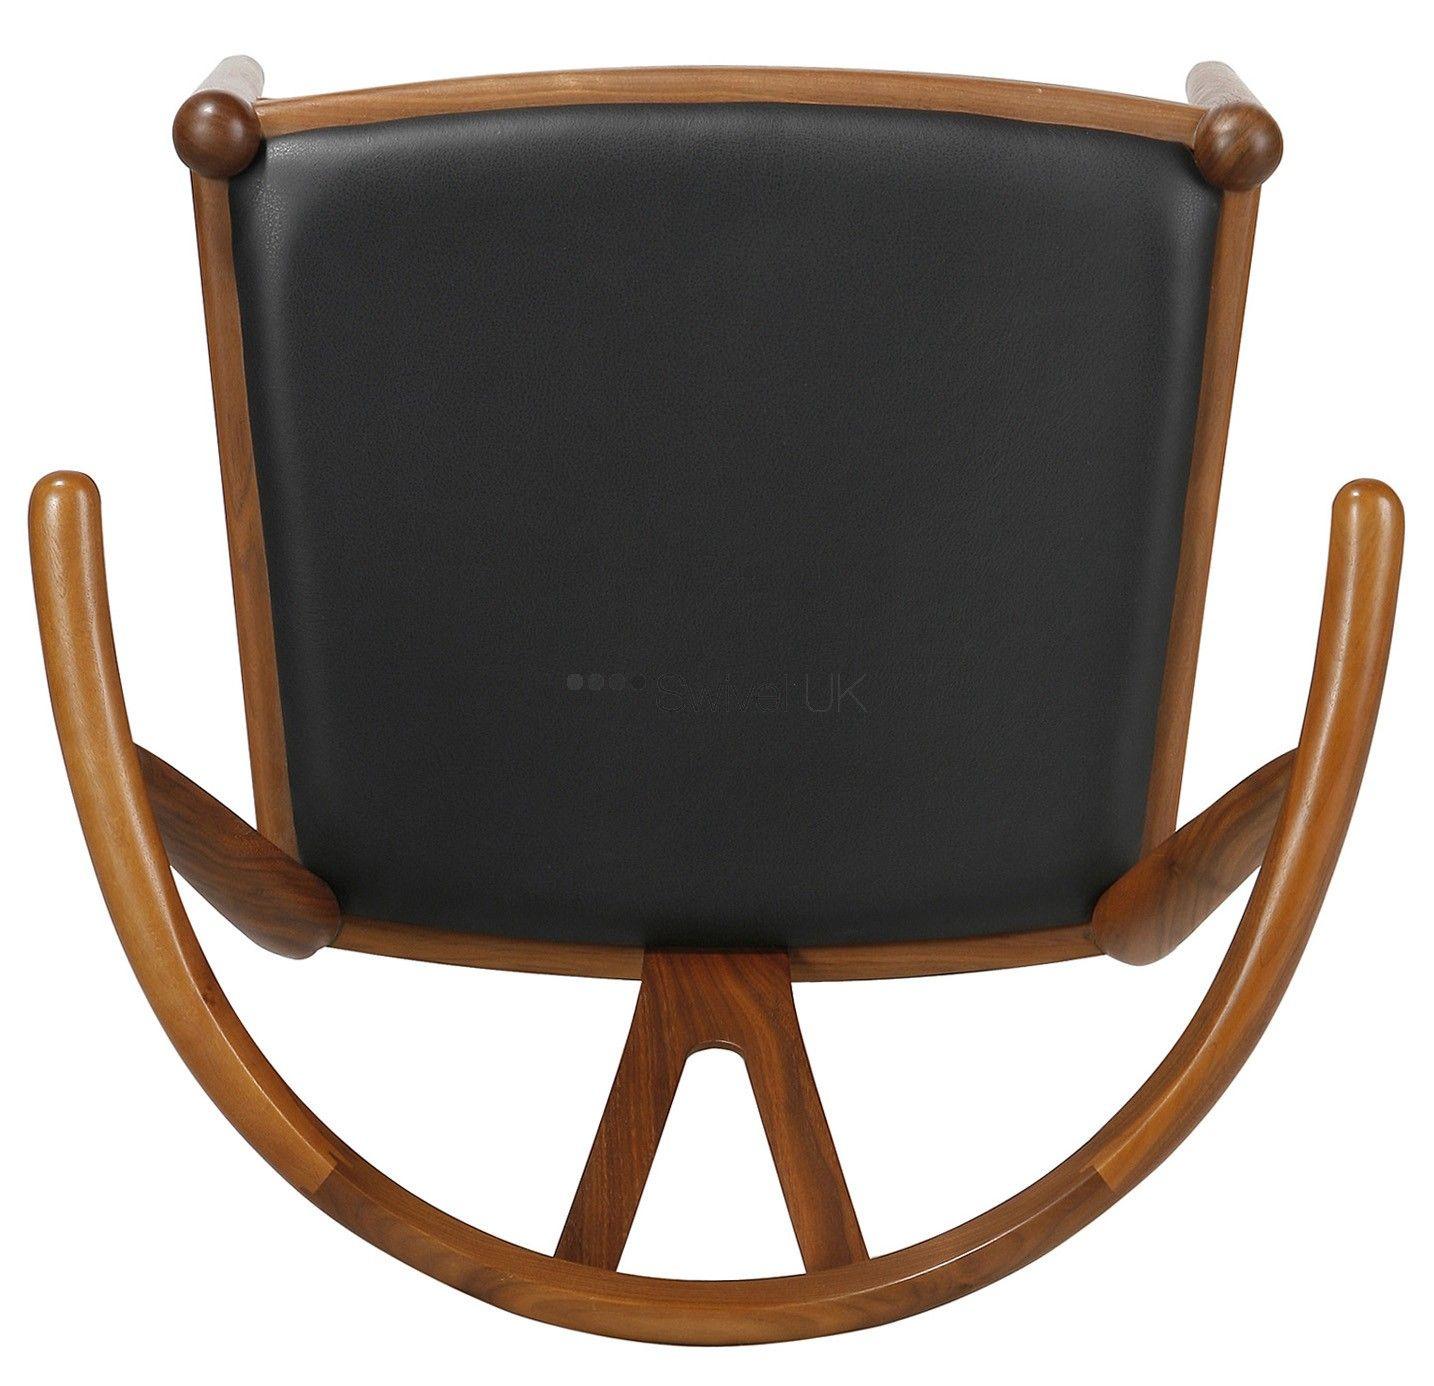 Hans j wegner style ch24 wishbone y dining chair leather